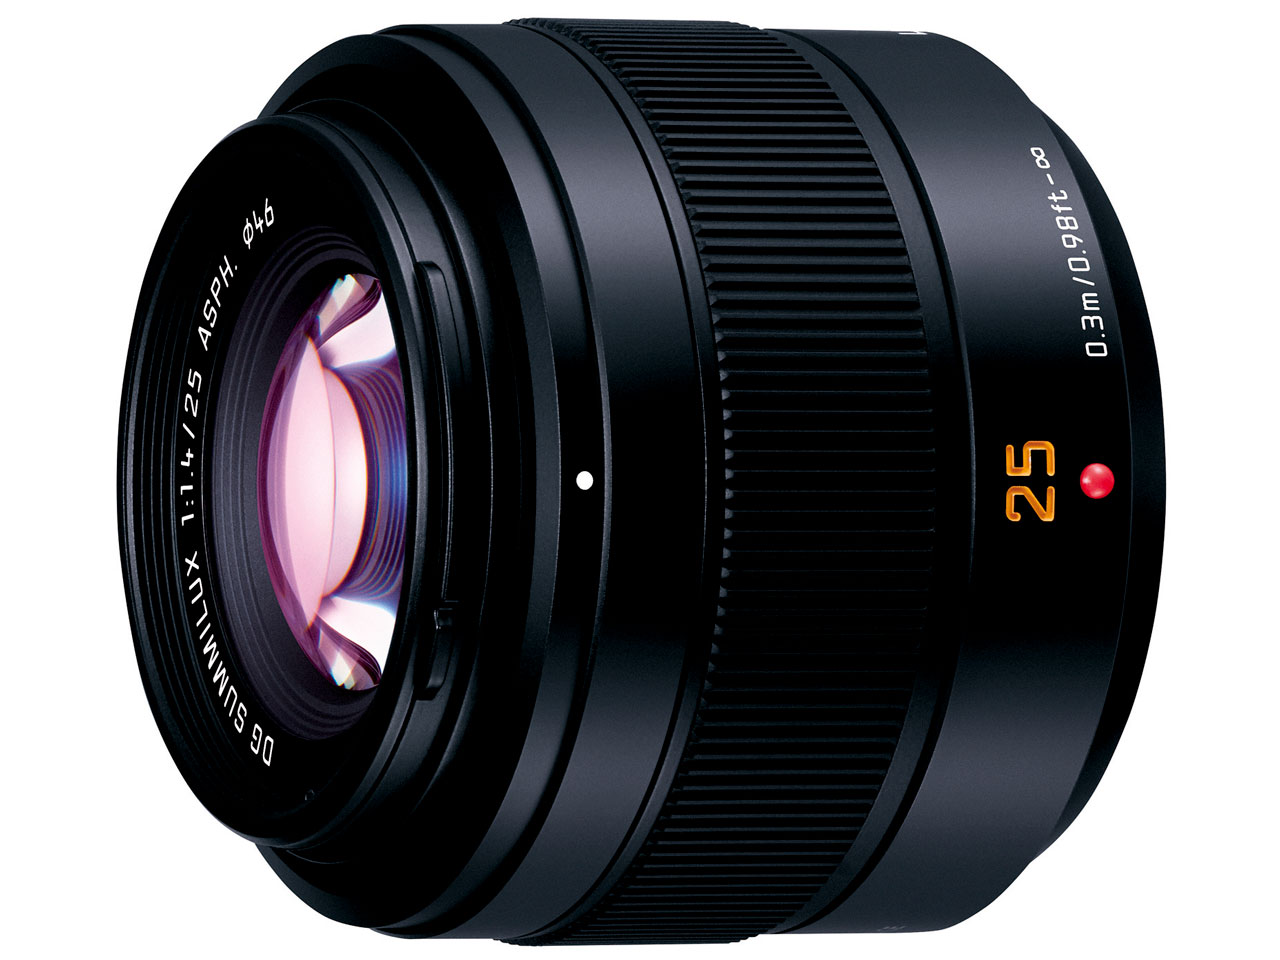 LEICA DG SUMMILUX 25mm/F1.4 II ASPH. H-XA025